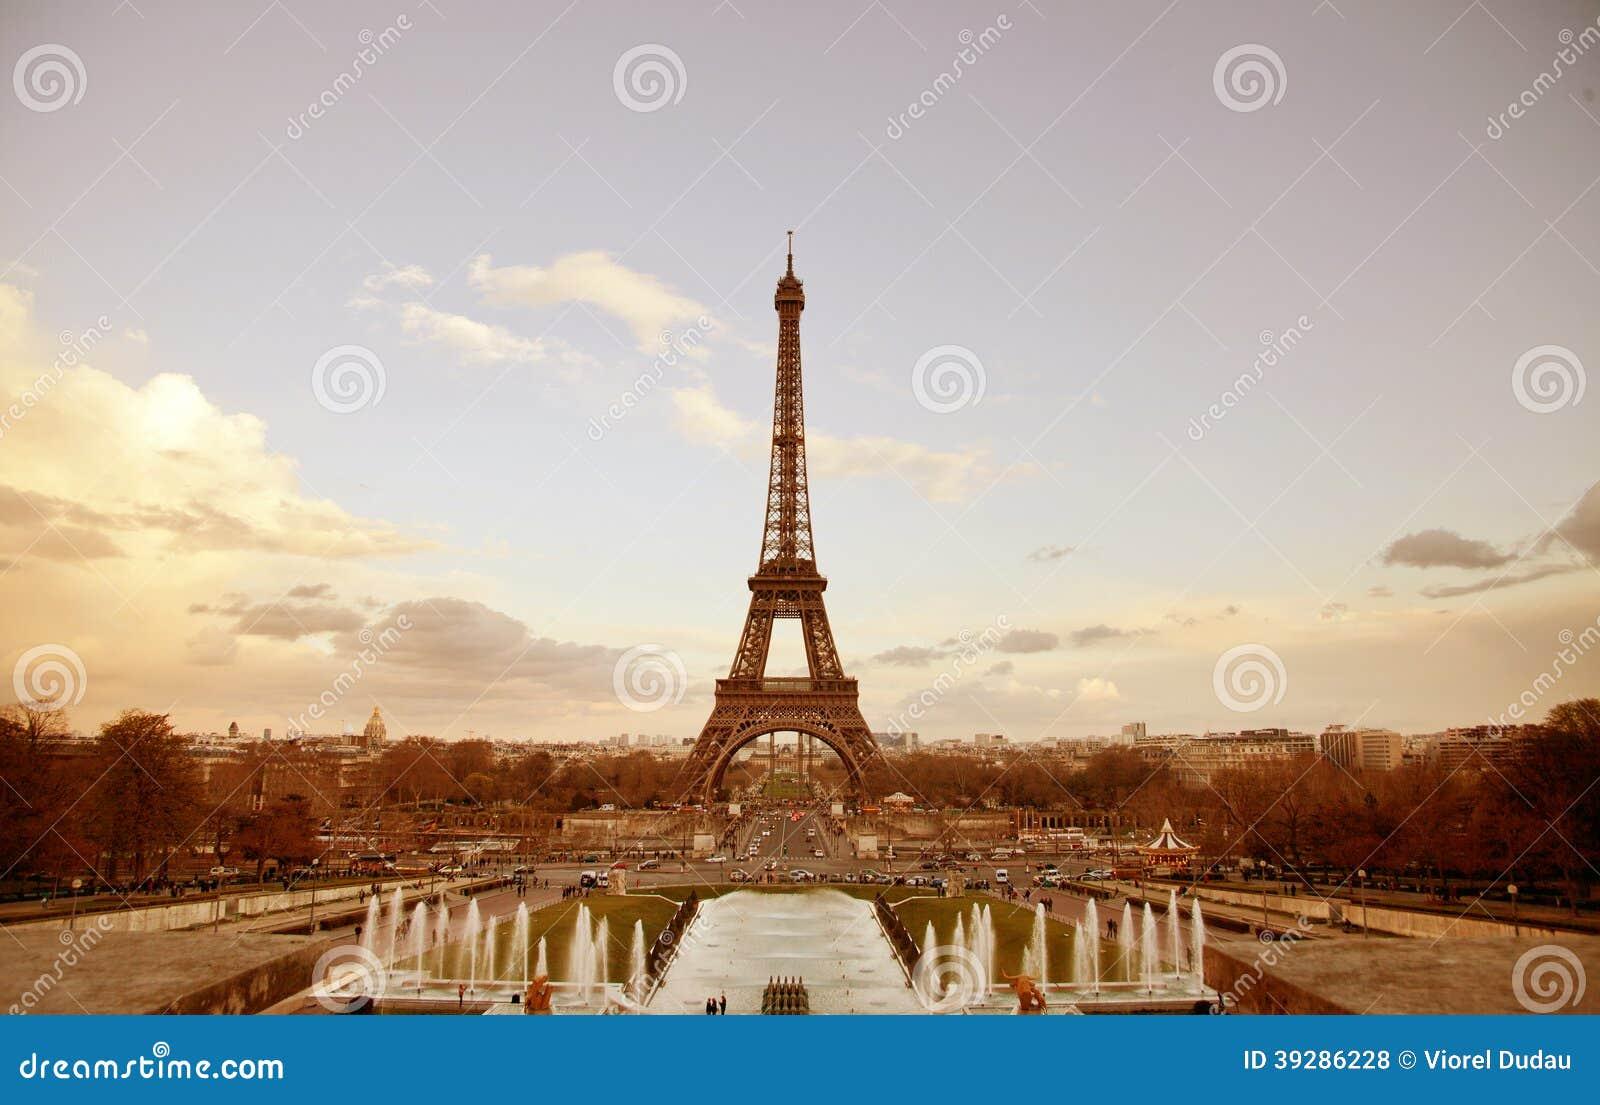 Paris sepia cityscape with Eiffel tower